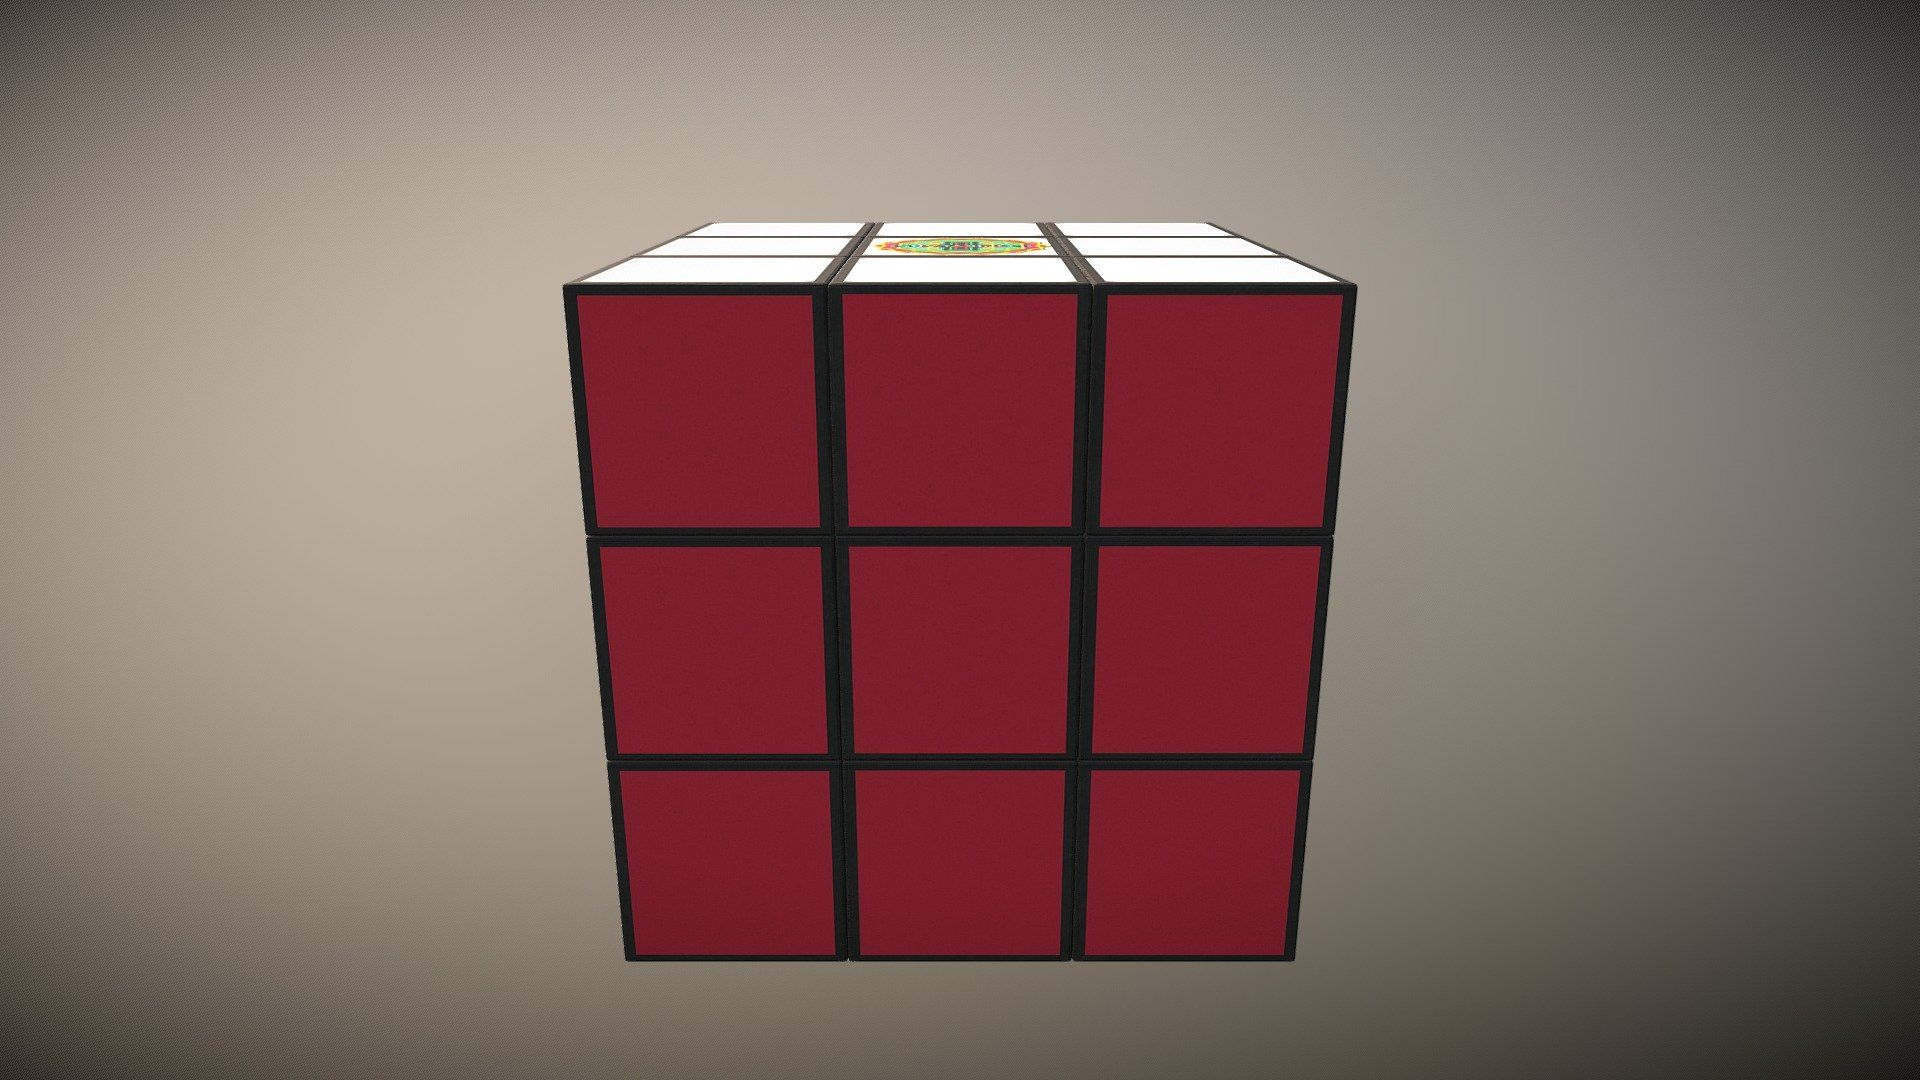 Rubiks Cube good wallpaper